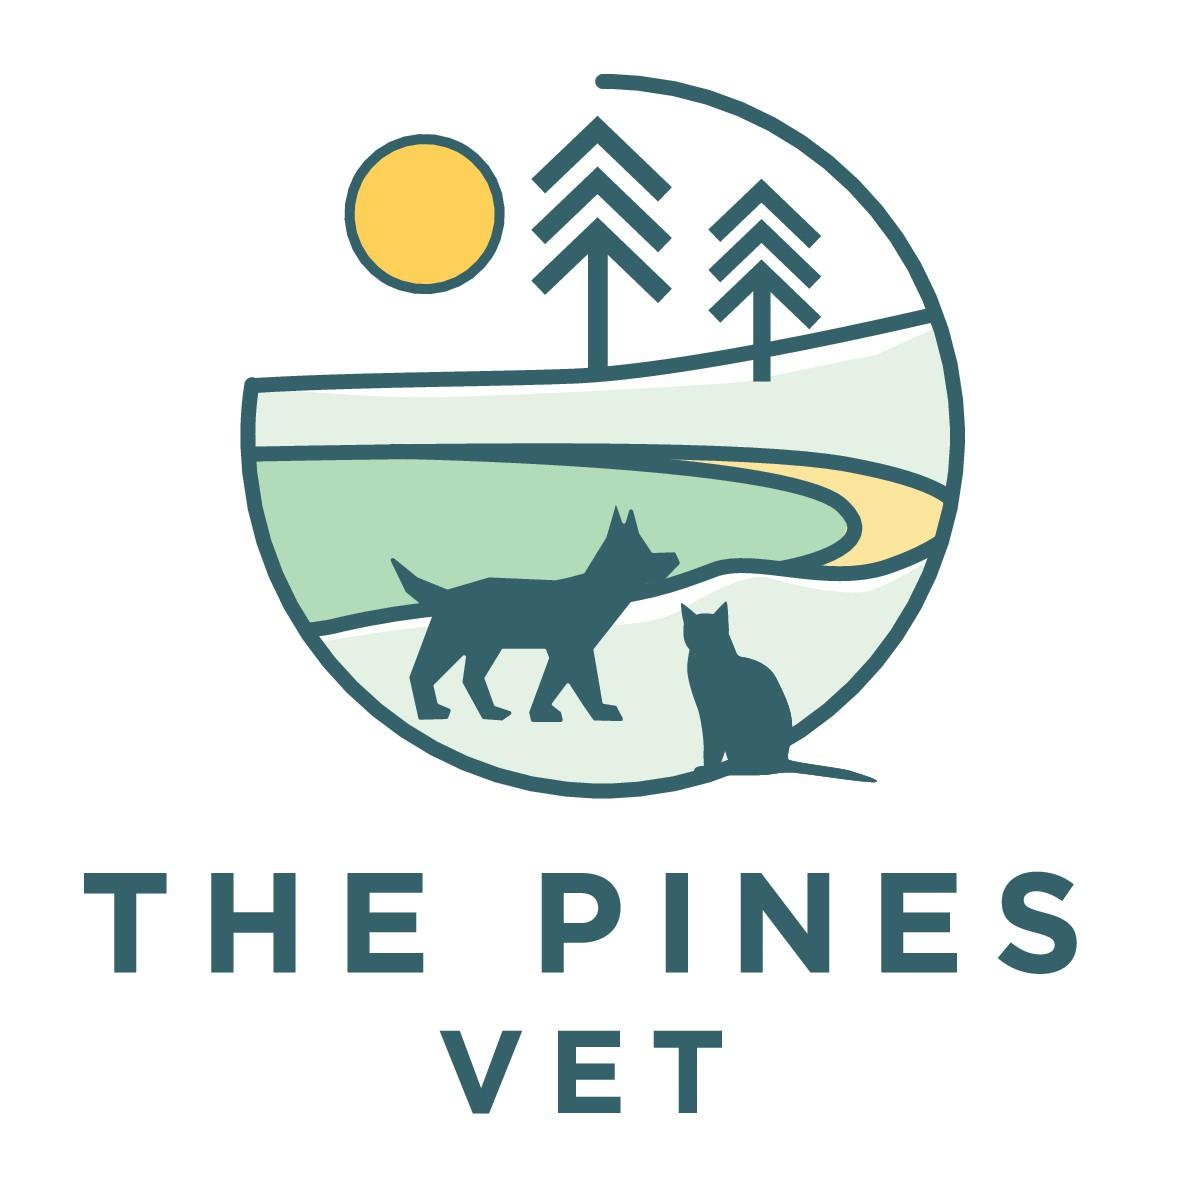 The Pines Vet needs a new logo!